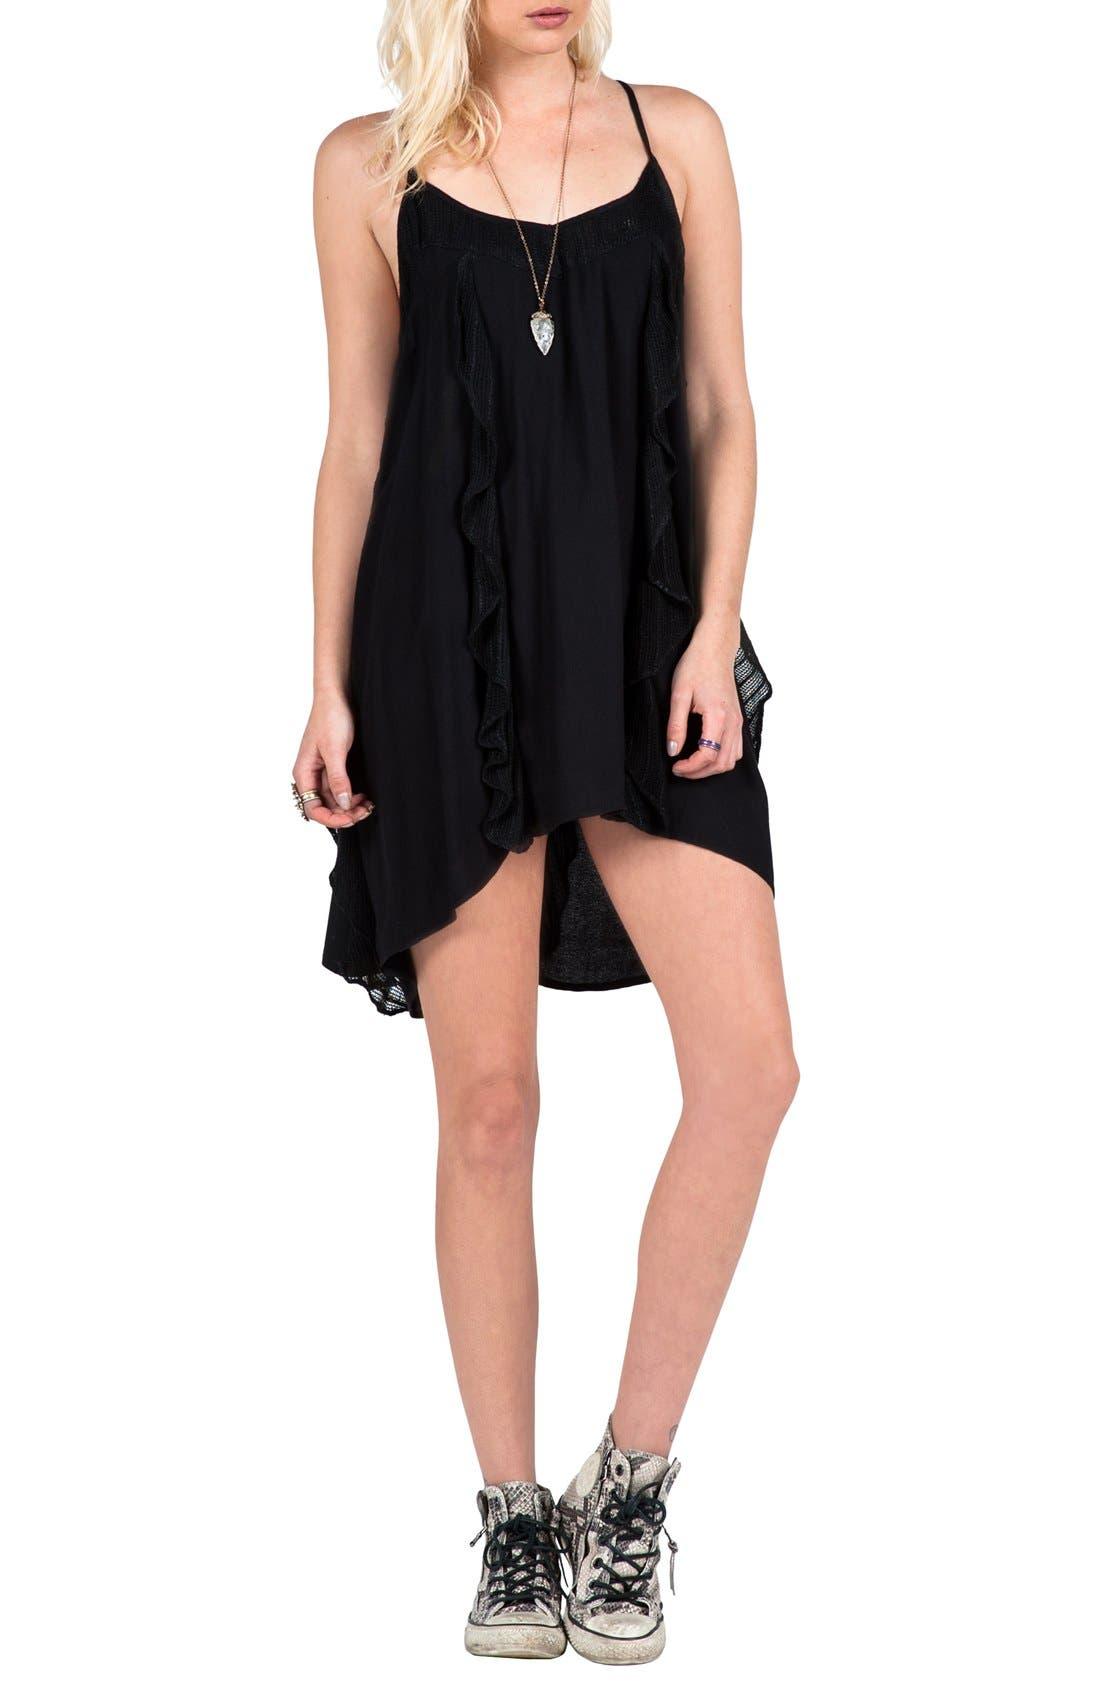 Main Image - Volcom 'Ruff Crowd' Strappy Slip Dress